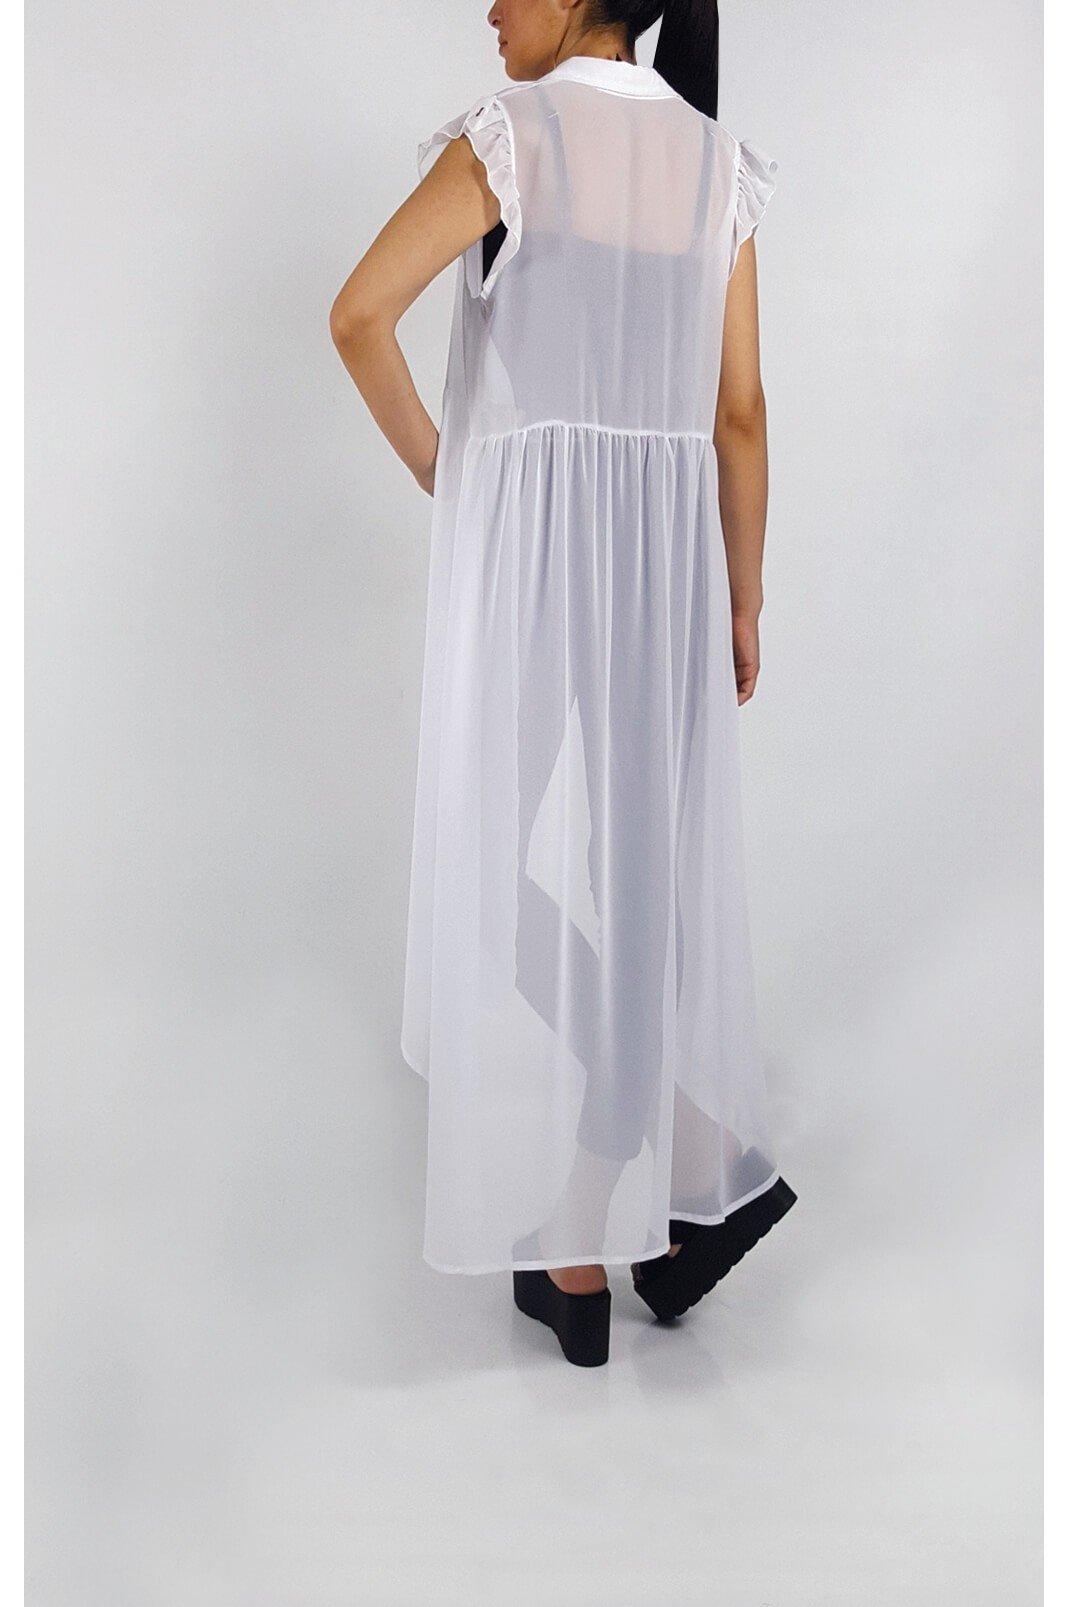 f30d5b78bcef Αμάνικη λευκή μακριά πουκαμίσα – Pick Store